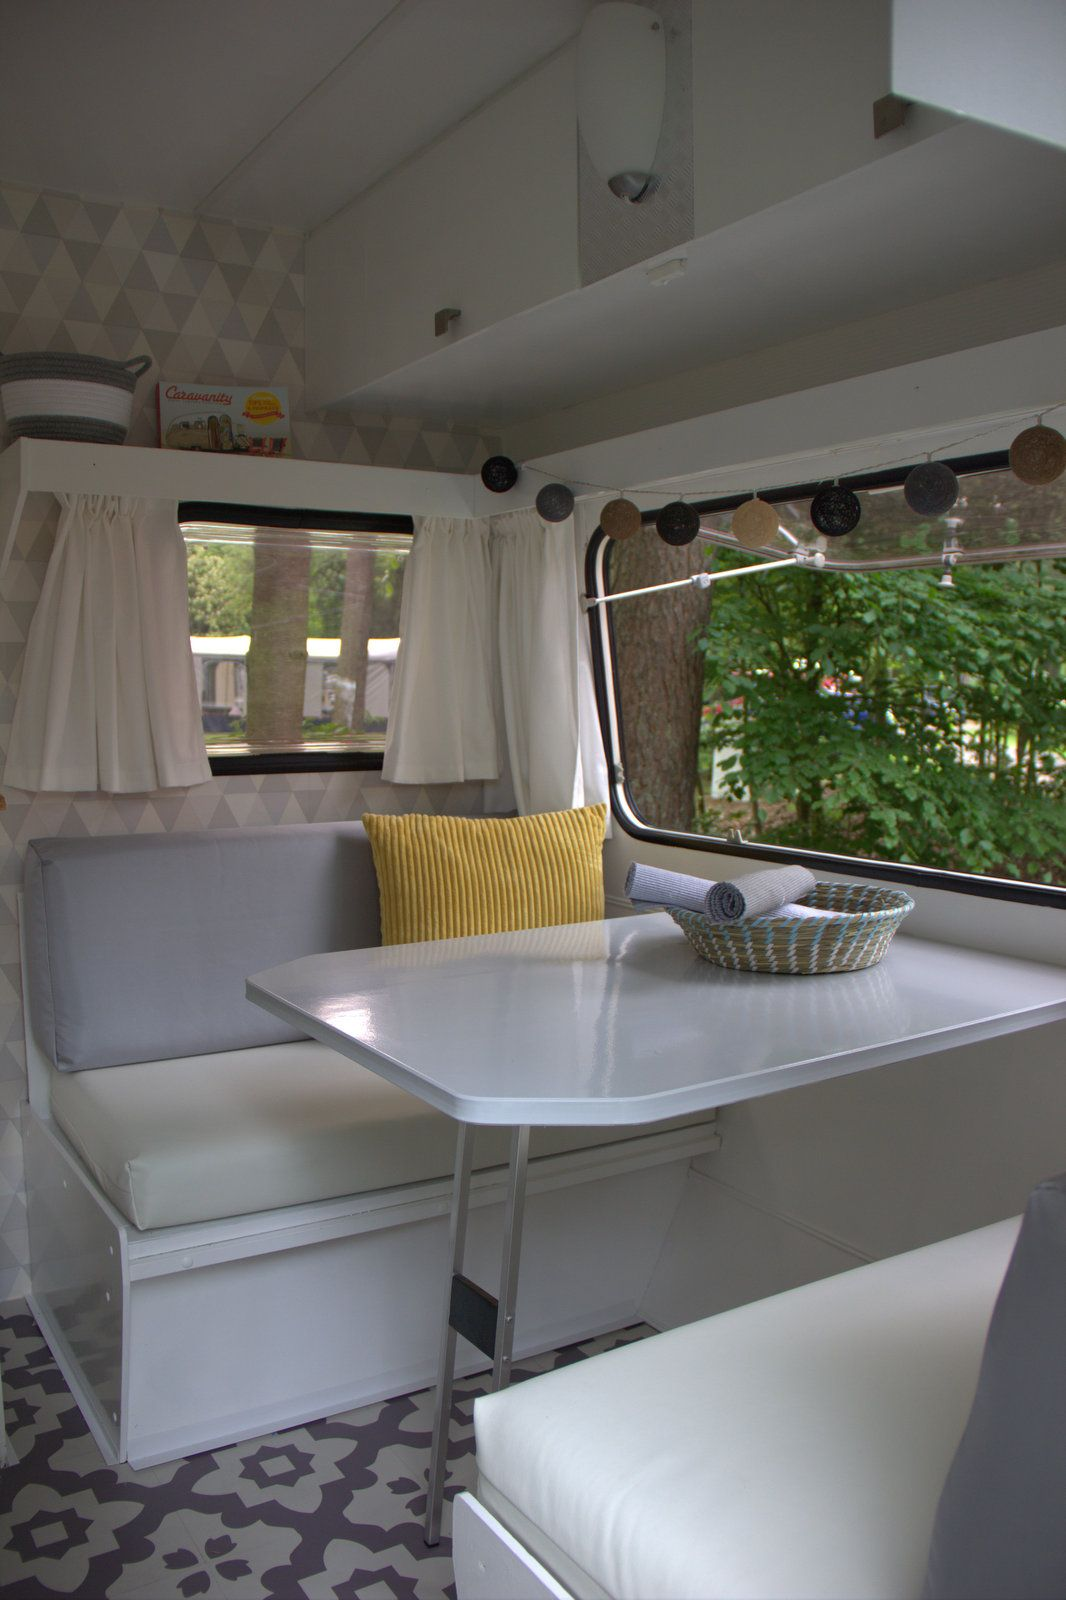 Marktplaats caravan Kip | Caravanity 5 - caravan ideas | Pinterest ...